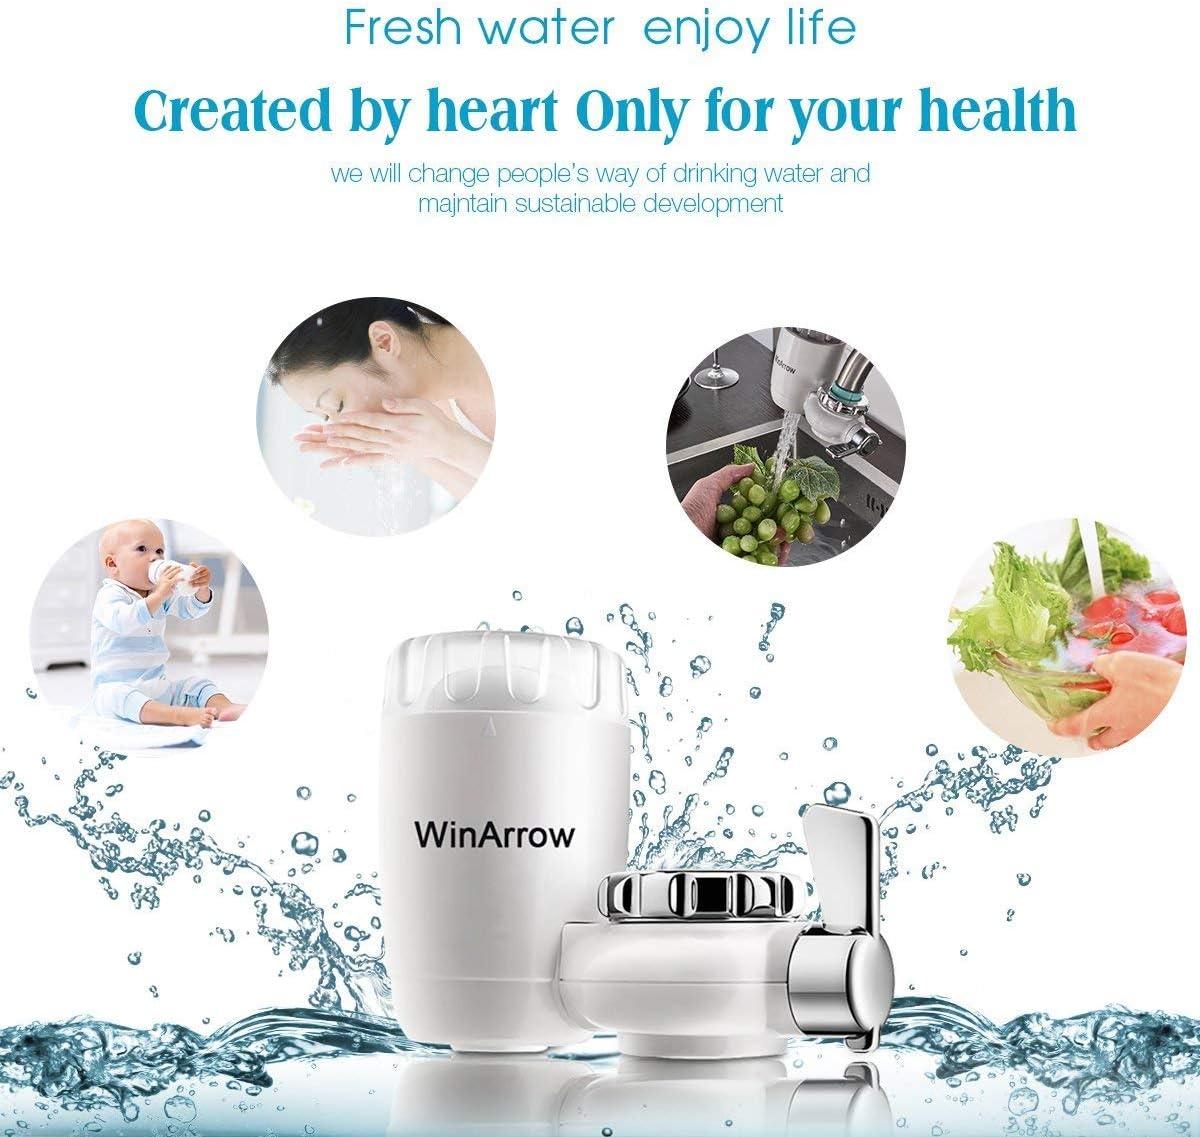 WinArrow- Filtro de Agua Para Grifo, KDF55 Filtro de Grifo con Tecnología GAC Filtro de Cerámica de Alta Precisión para Cocina / Baño: Amazon.es: Hogar